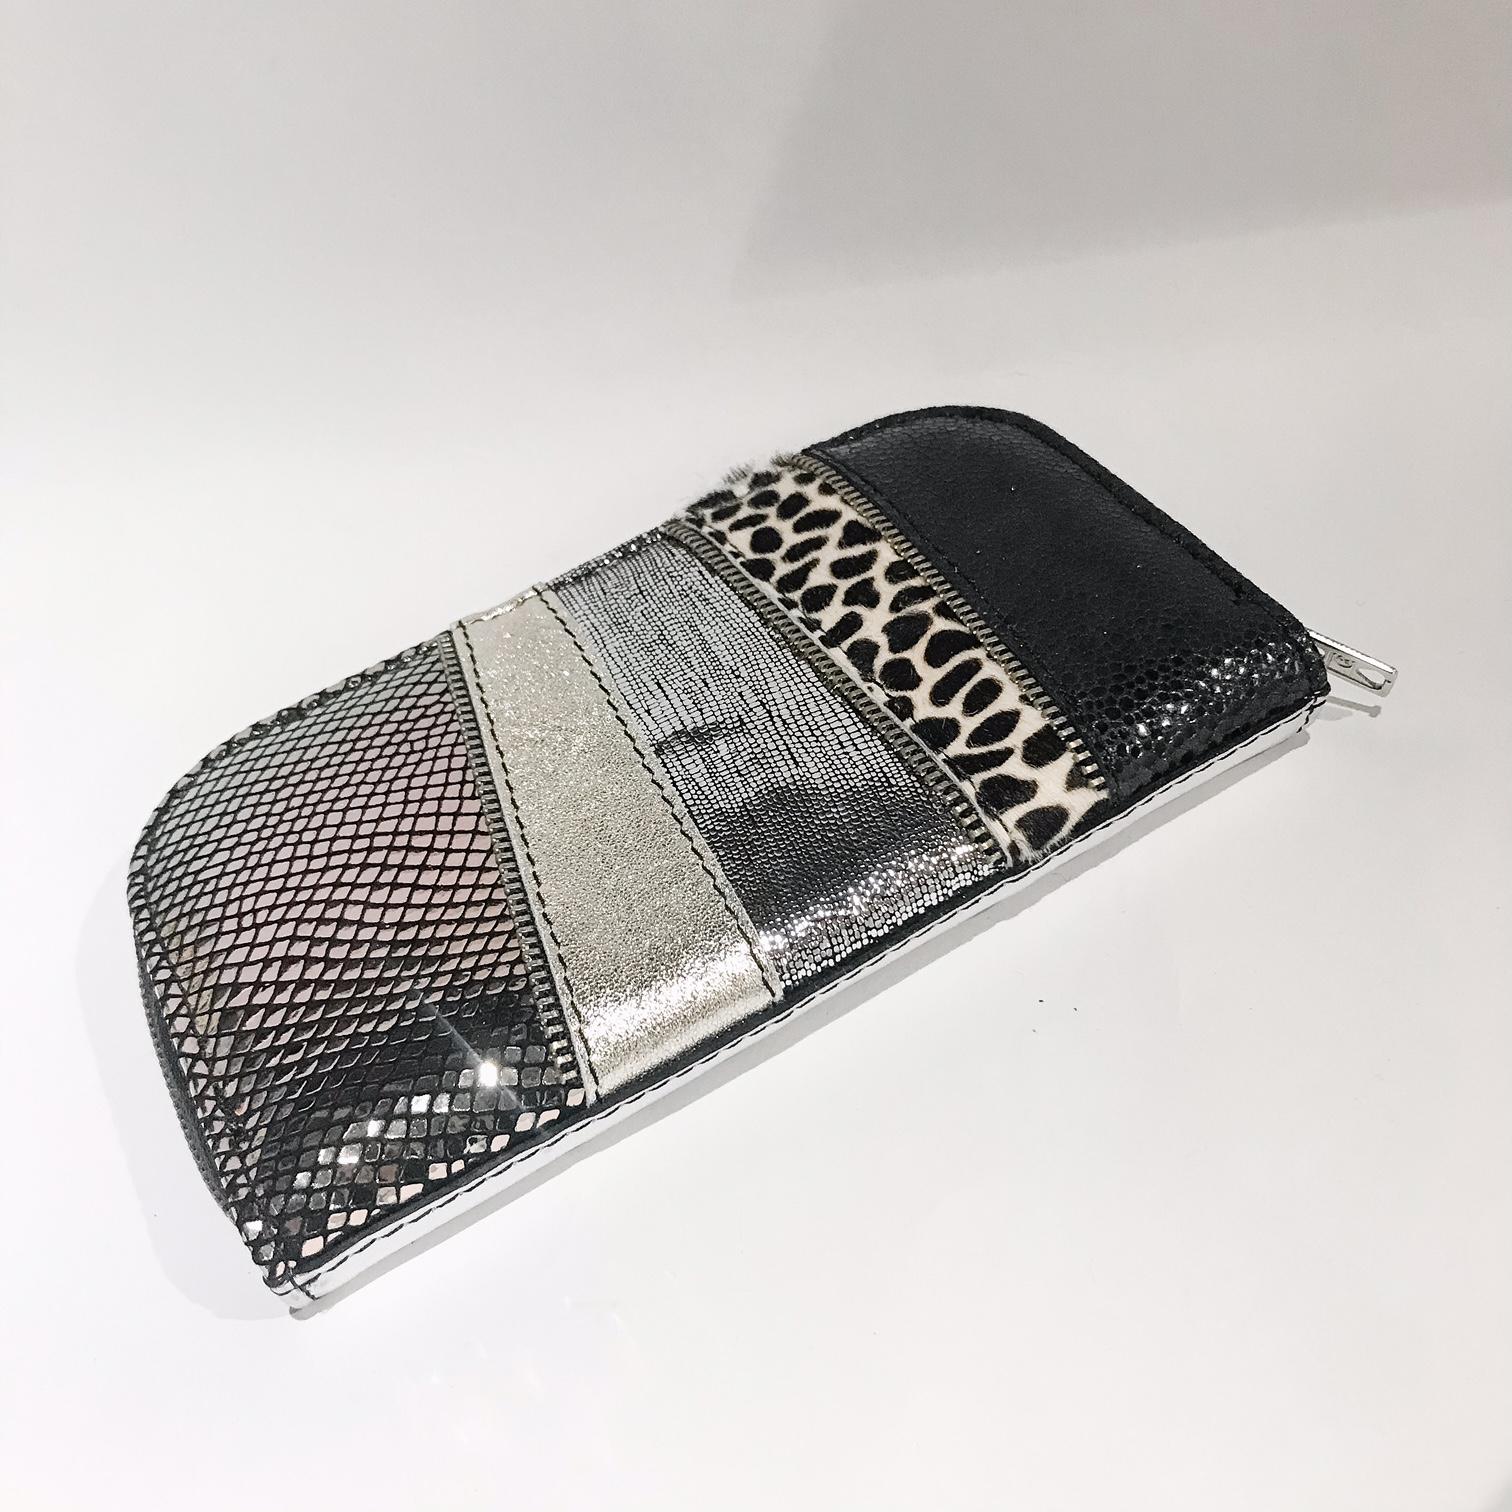 HotSilver Chic Maxi Wallet EvilEve